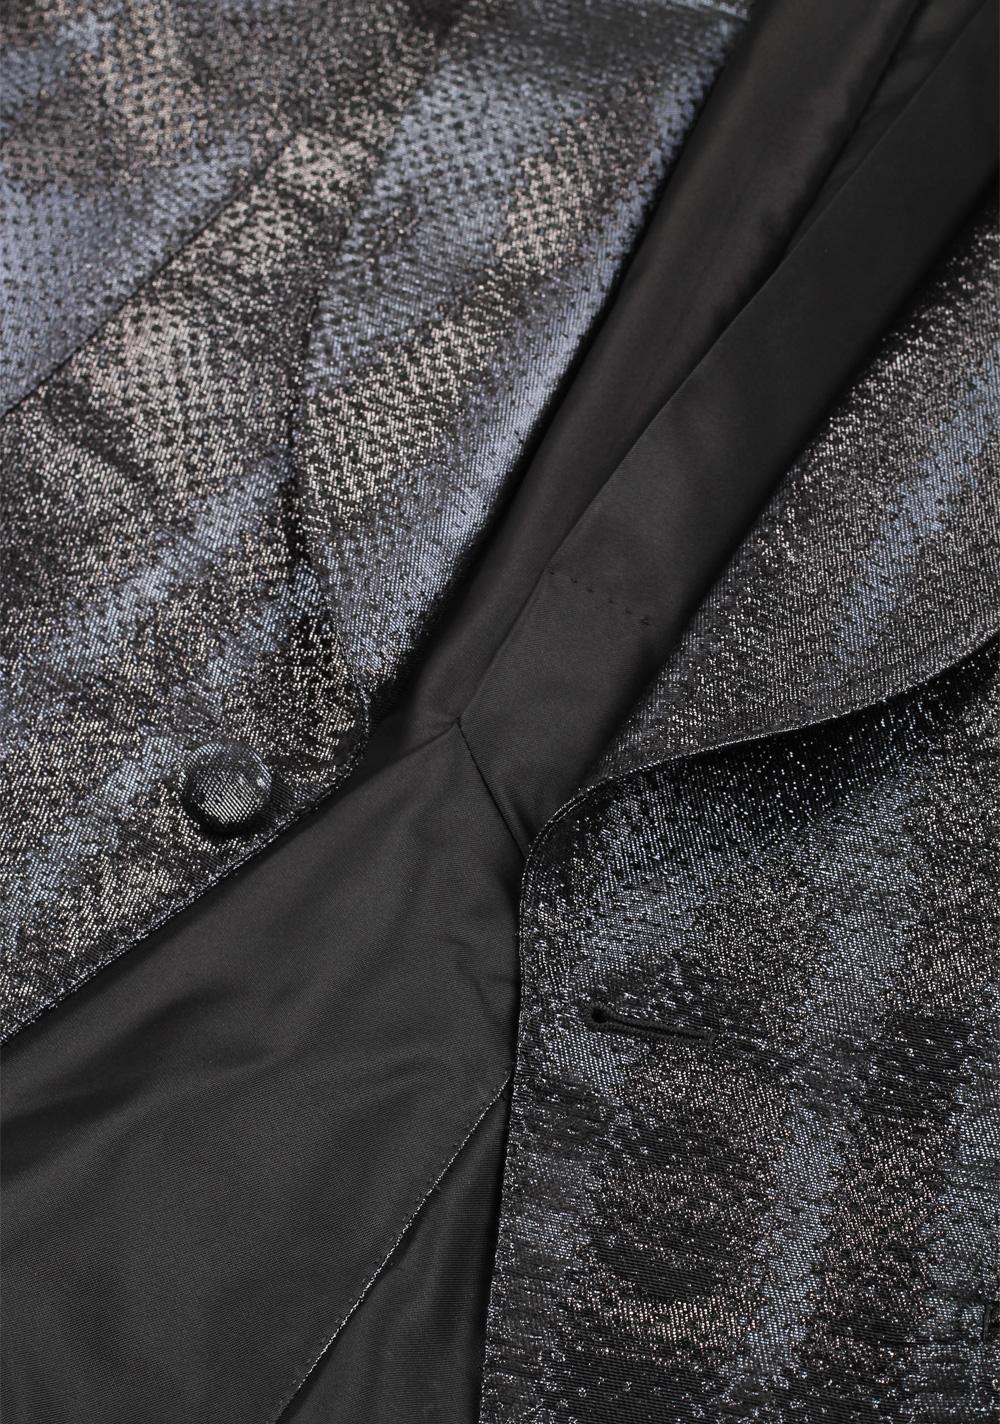 TOM FORD Atticus Black Tuxedo Dinner Jacket Size 46 / 36R U.S.   Costume Limité